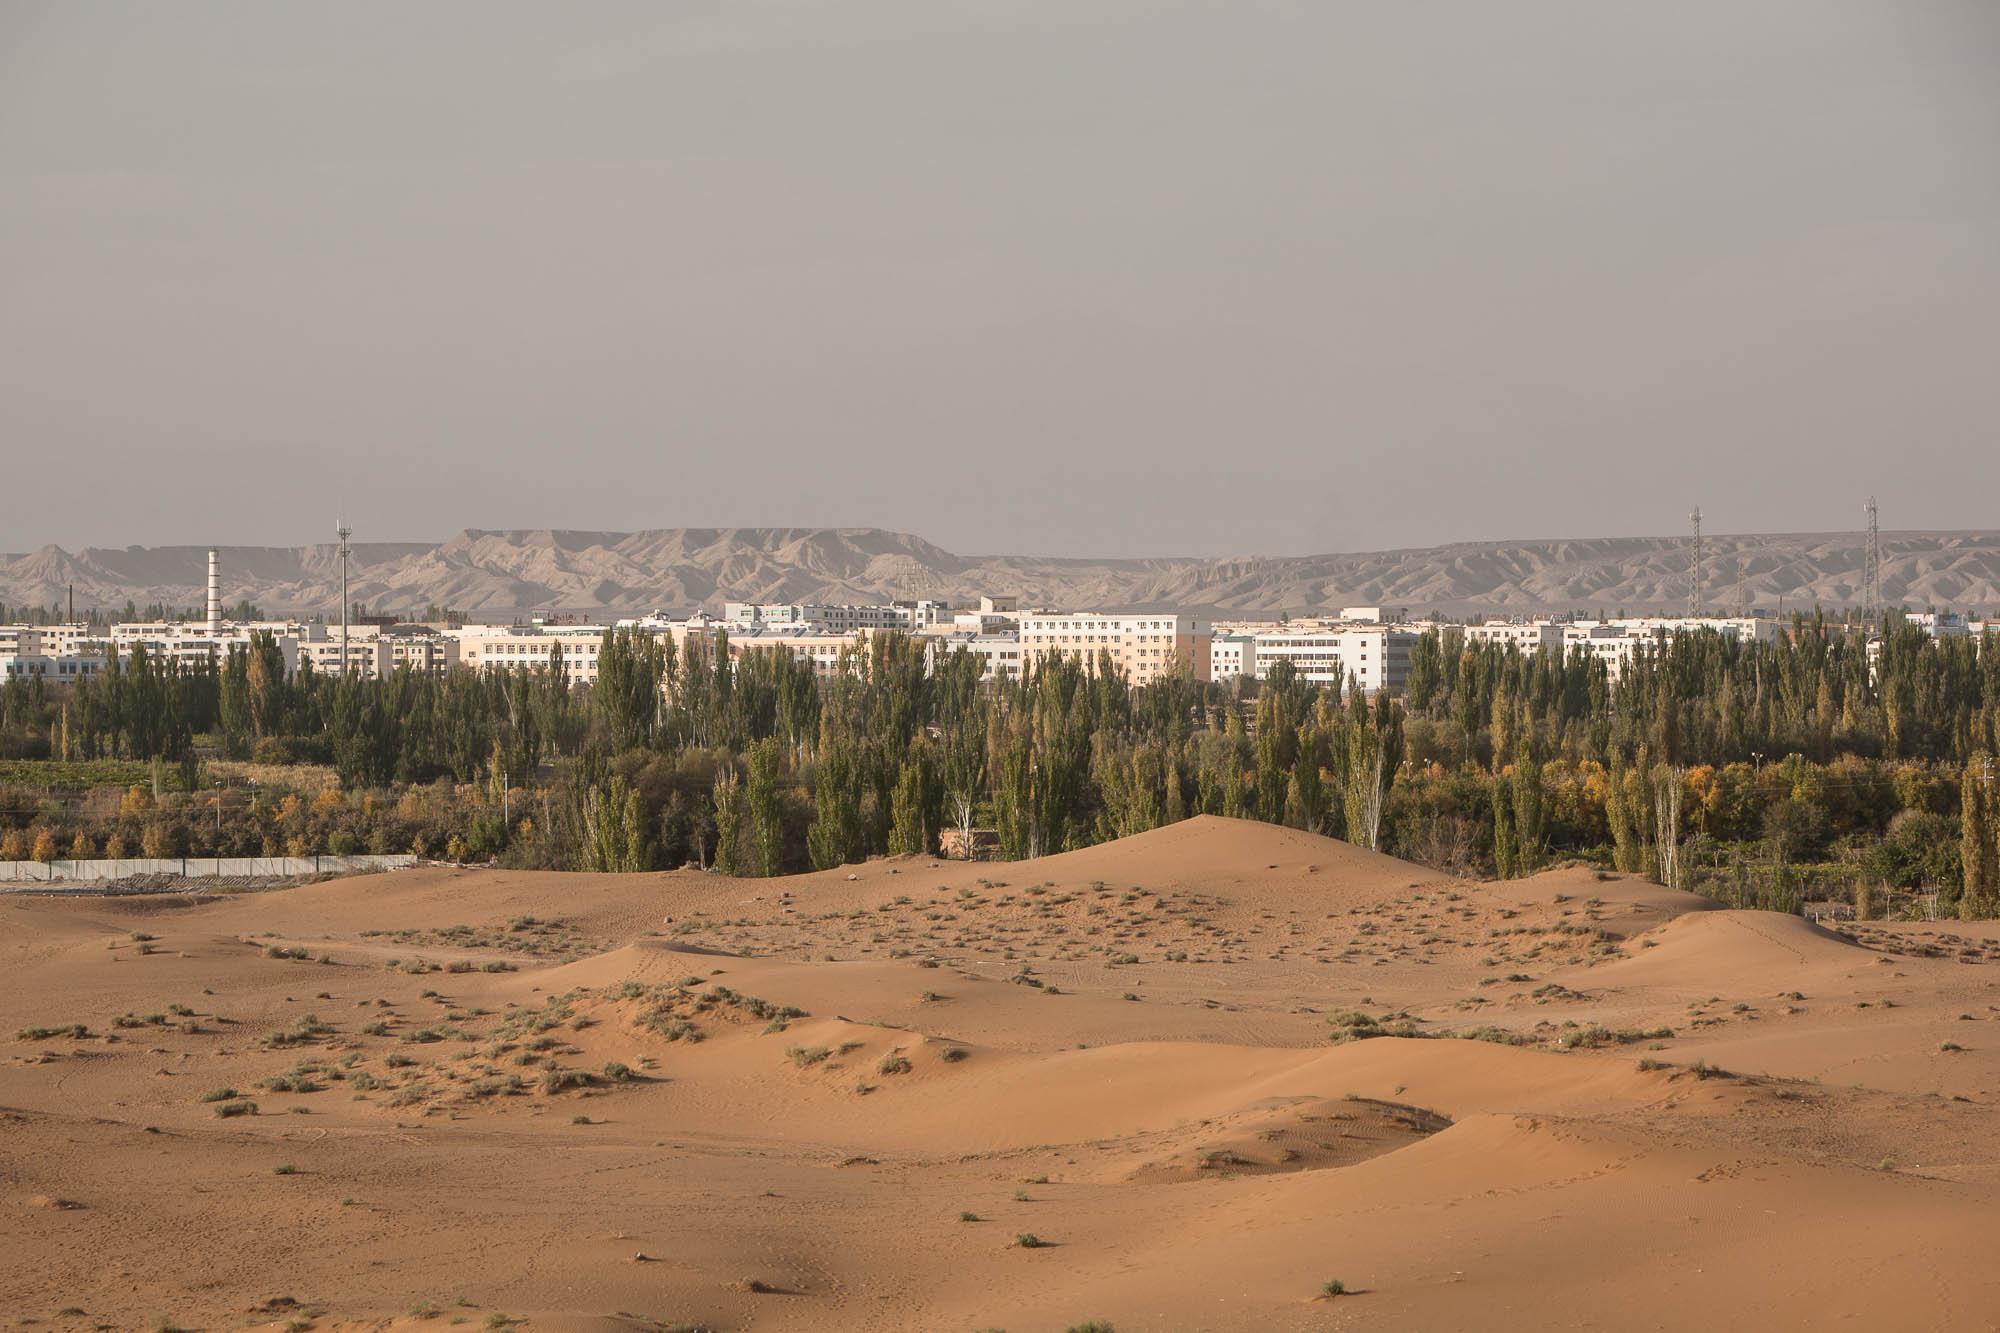 Shanshan and the desert